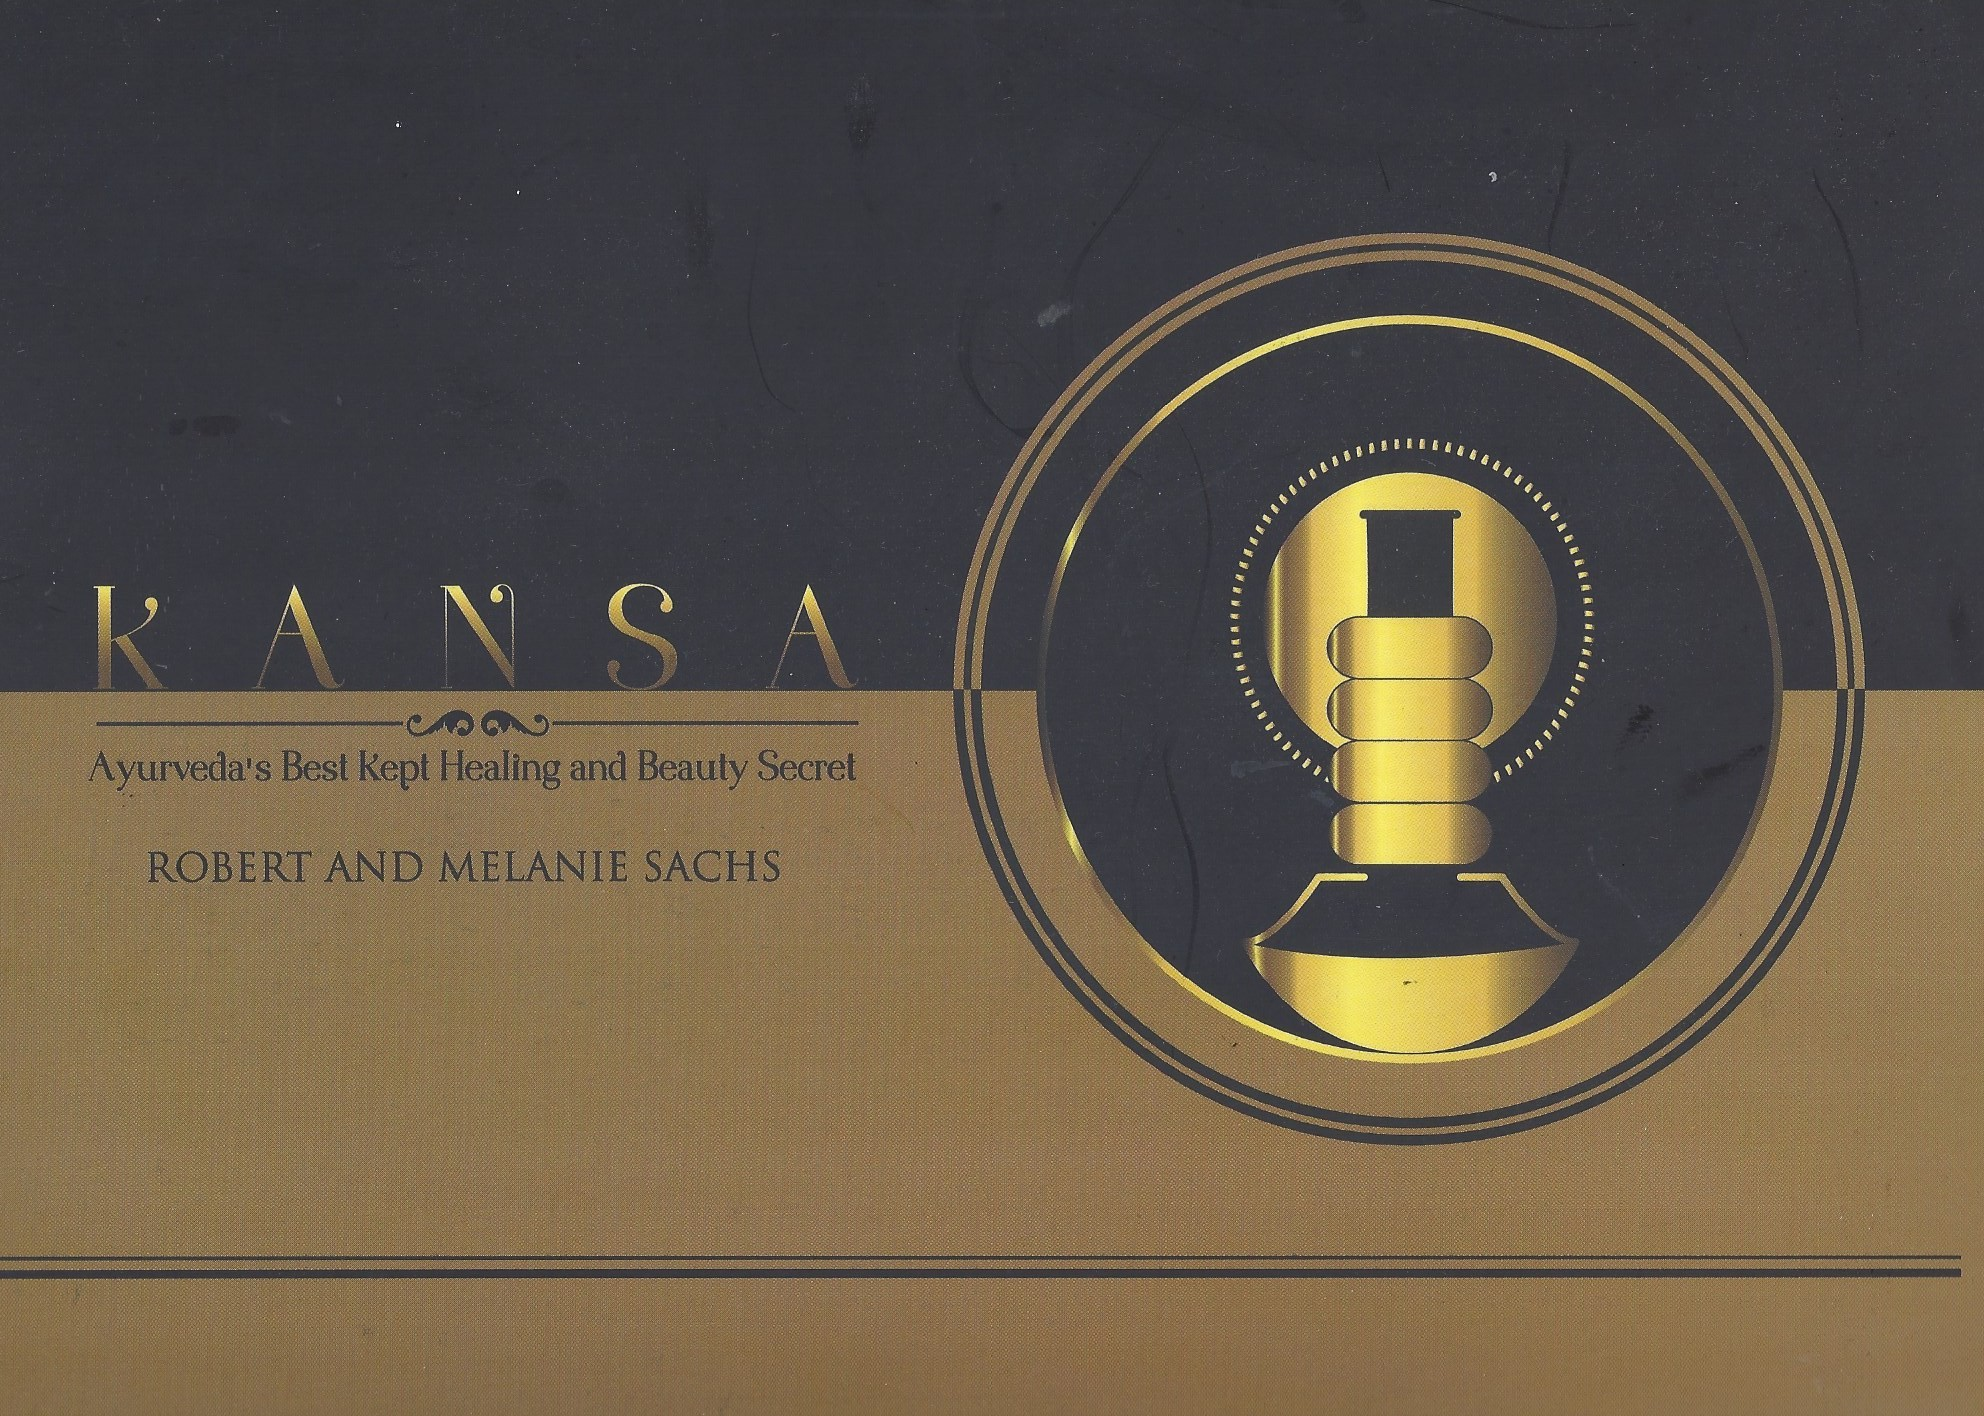 Kansa Wand Home Study Program